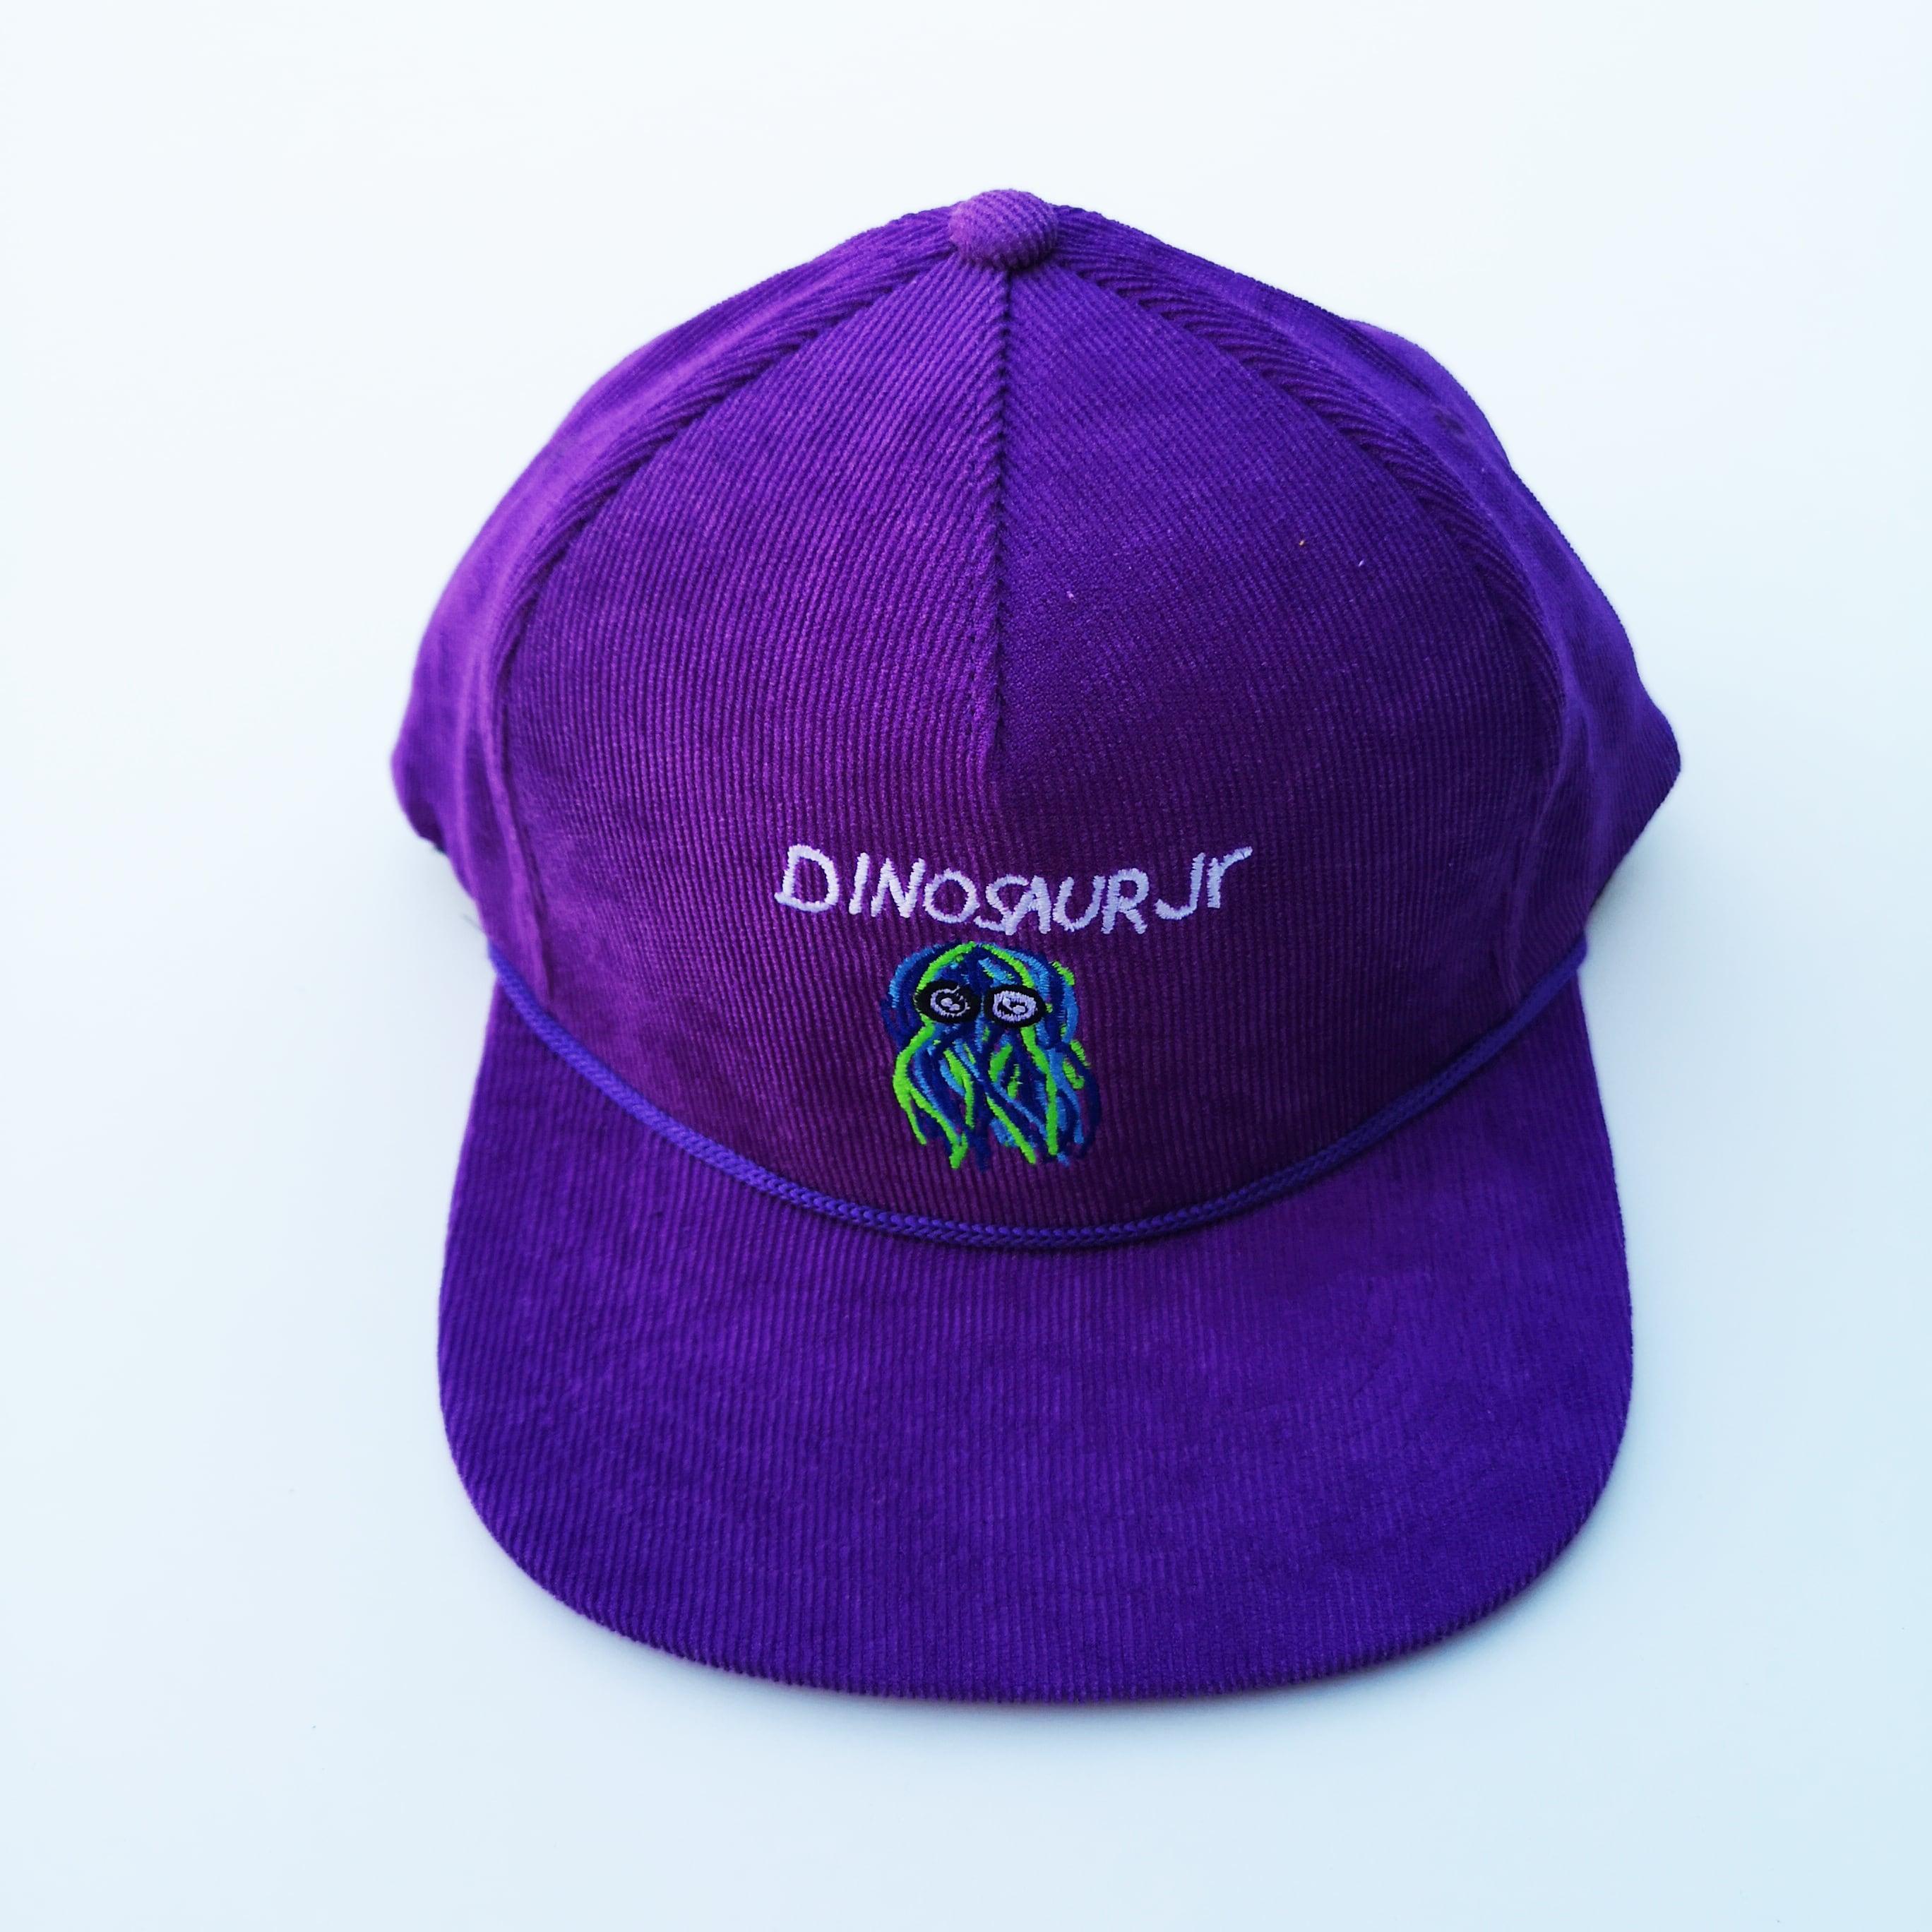 "Dinosaur Jr. ""Sweep It Into Space"" CORDUROY CAP"